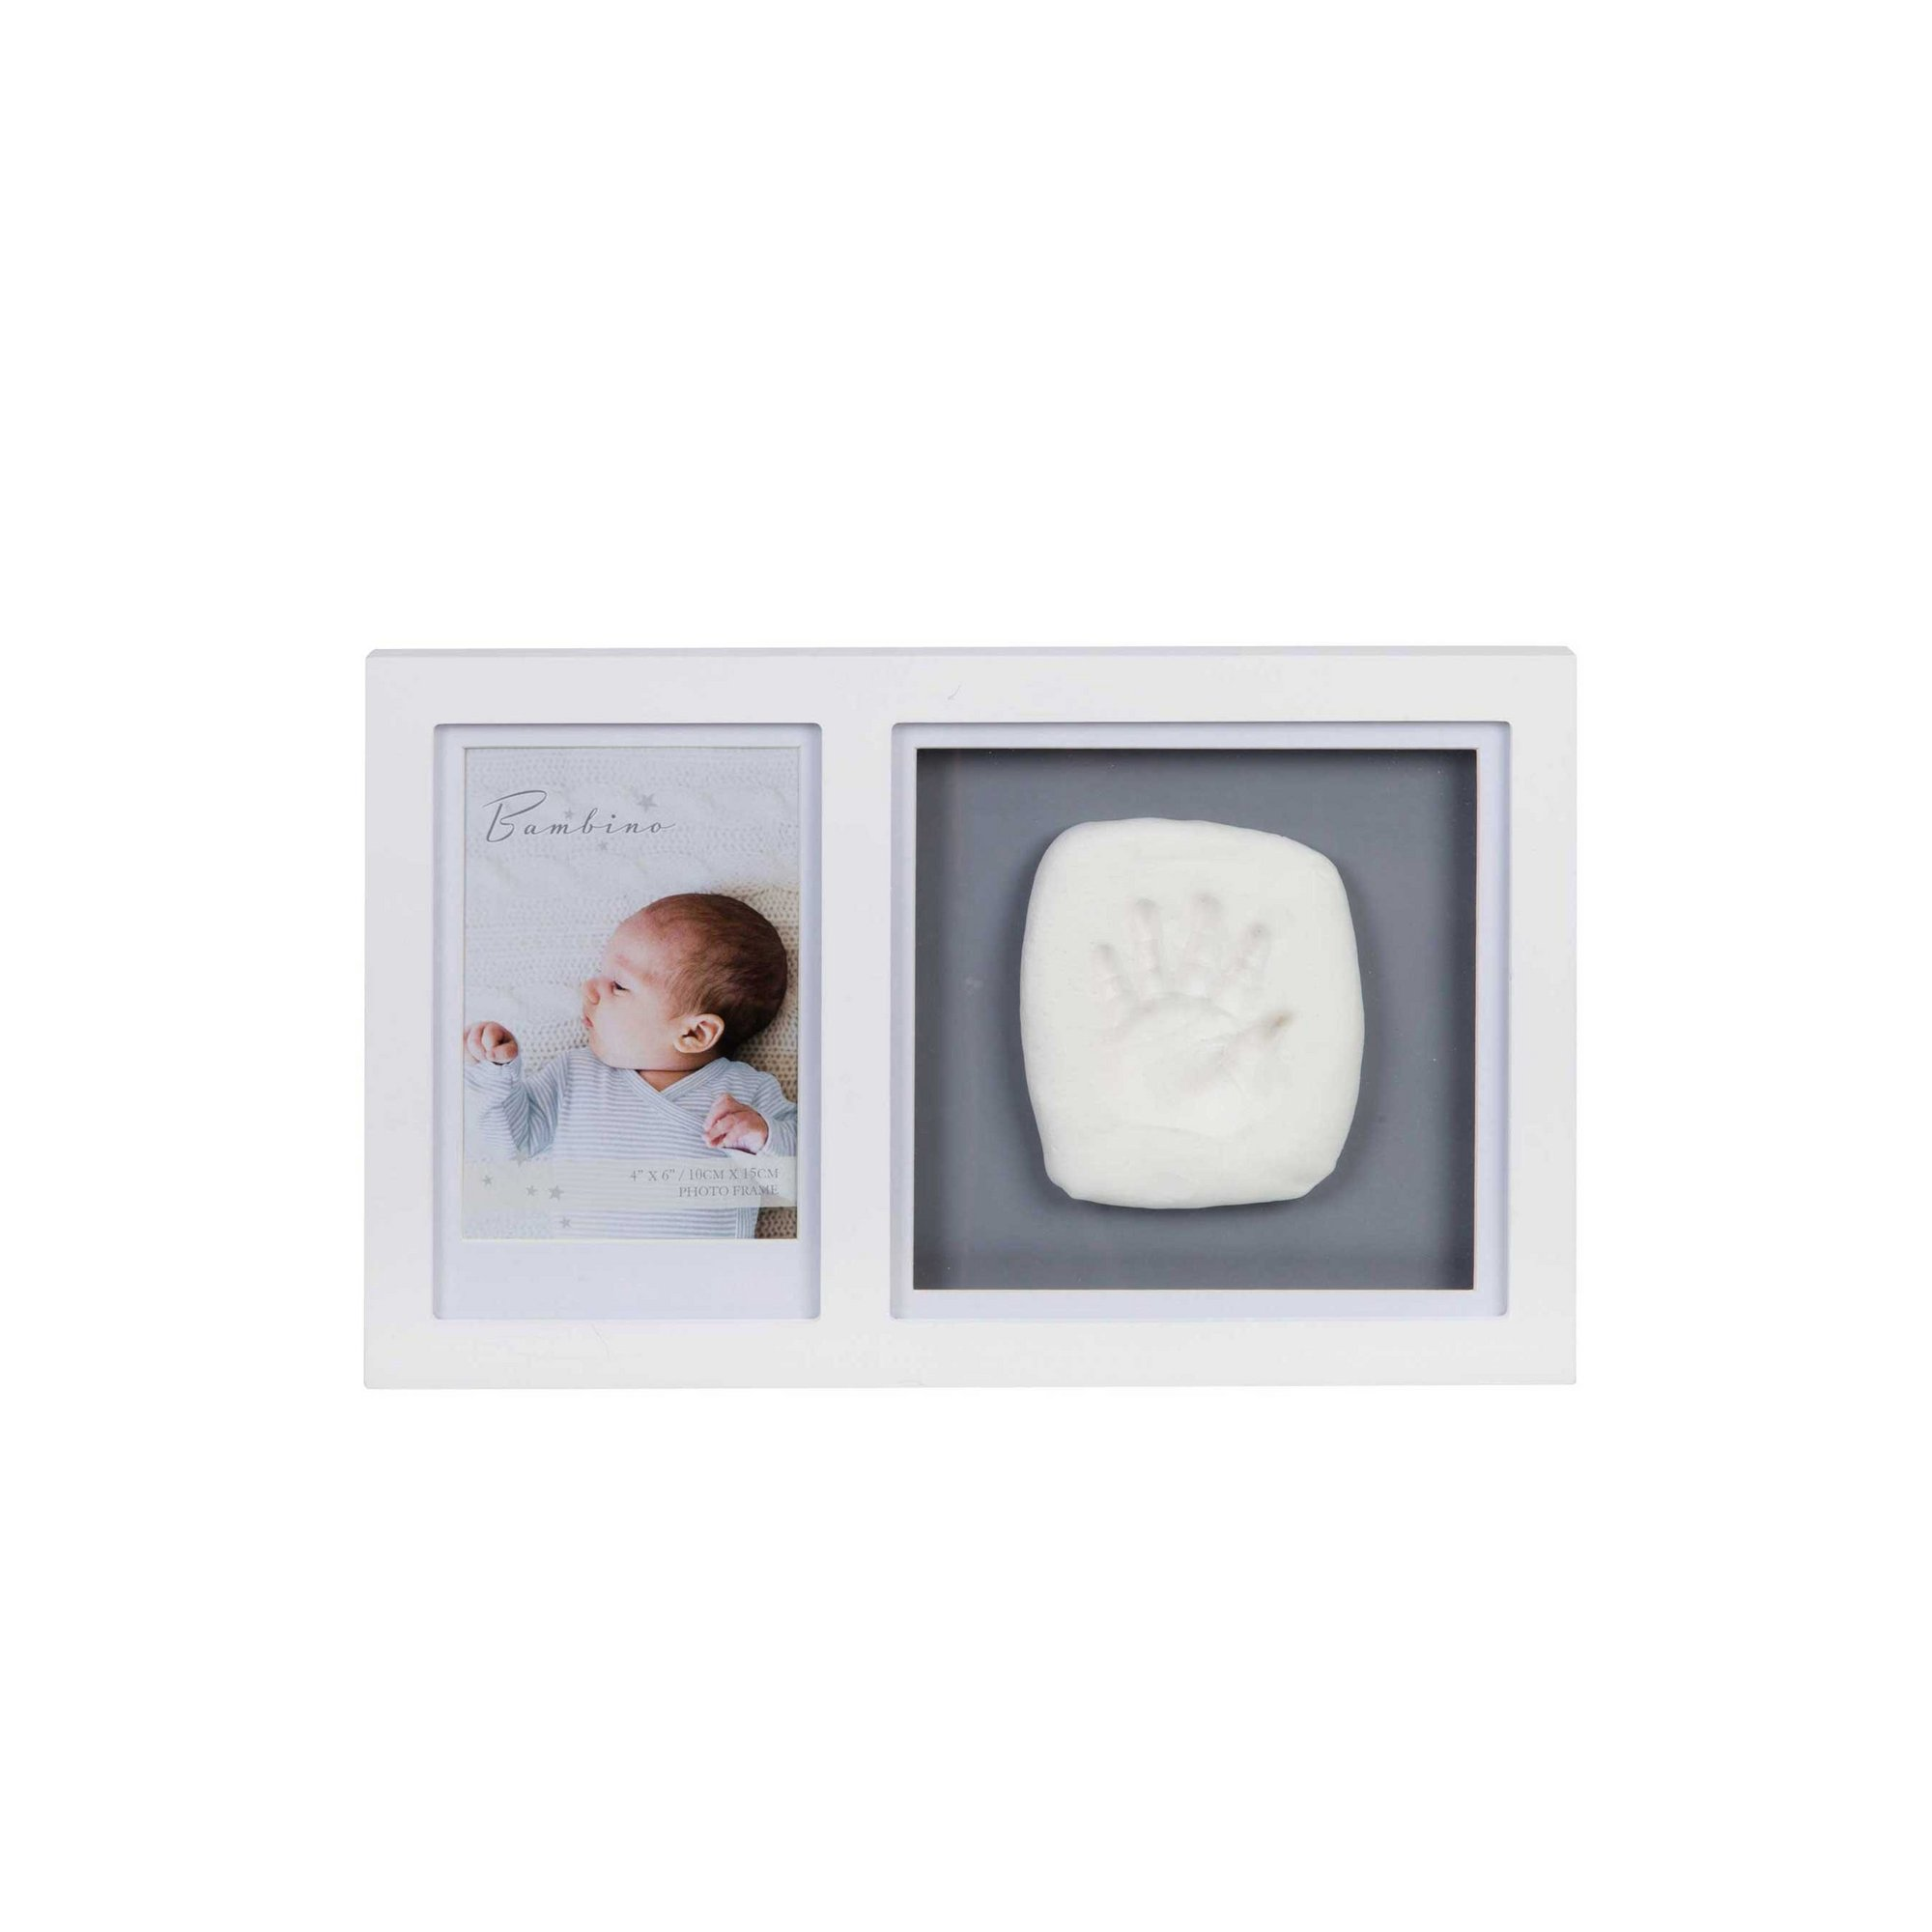 Image of 4 x 6 - Bambino White Photo Frame and Clay Print Kit